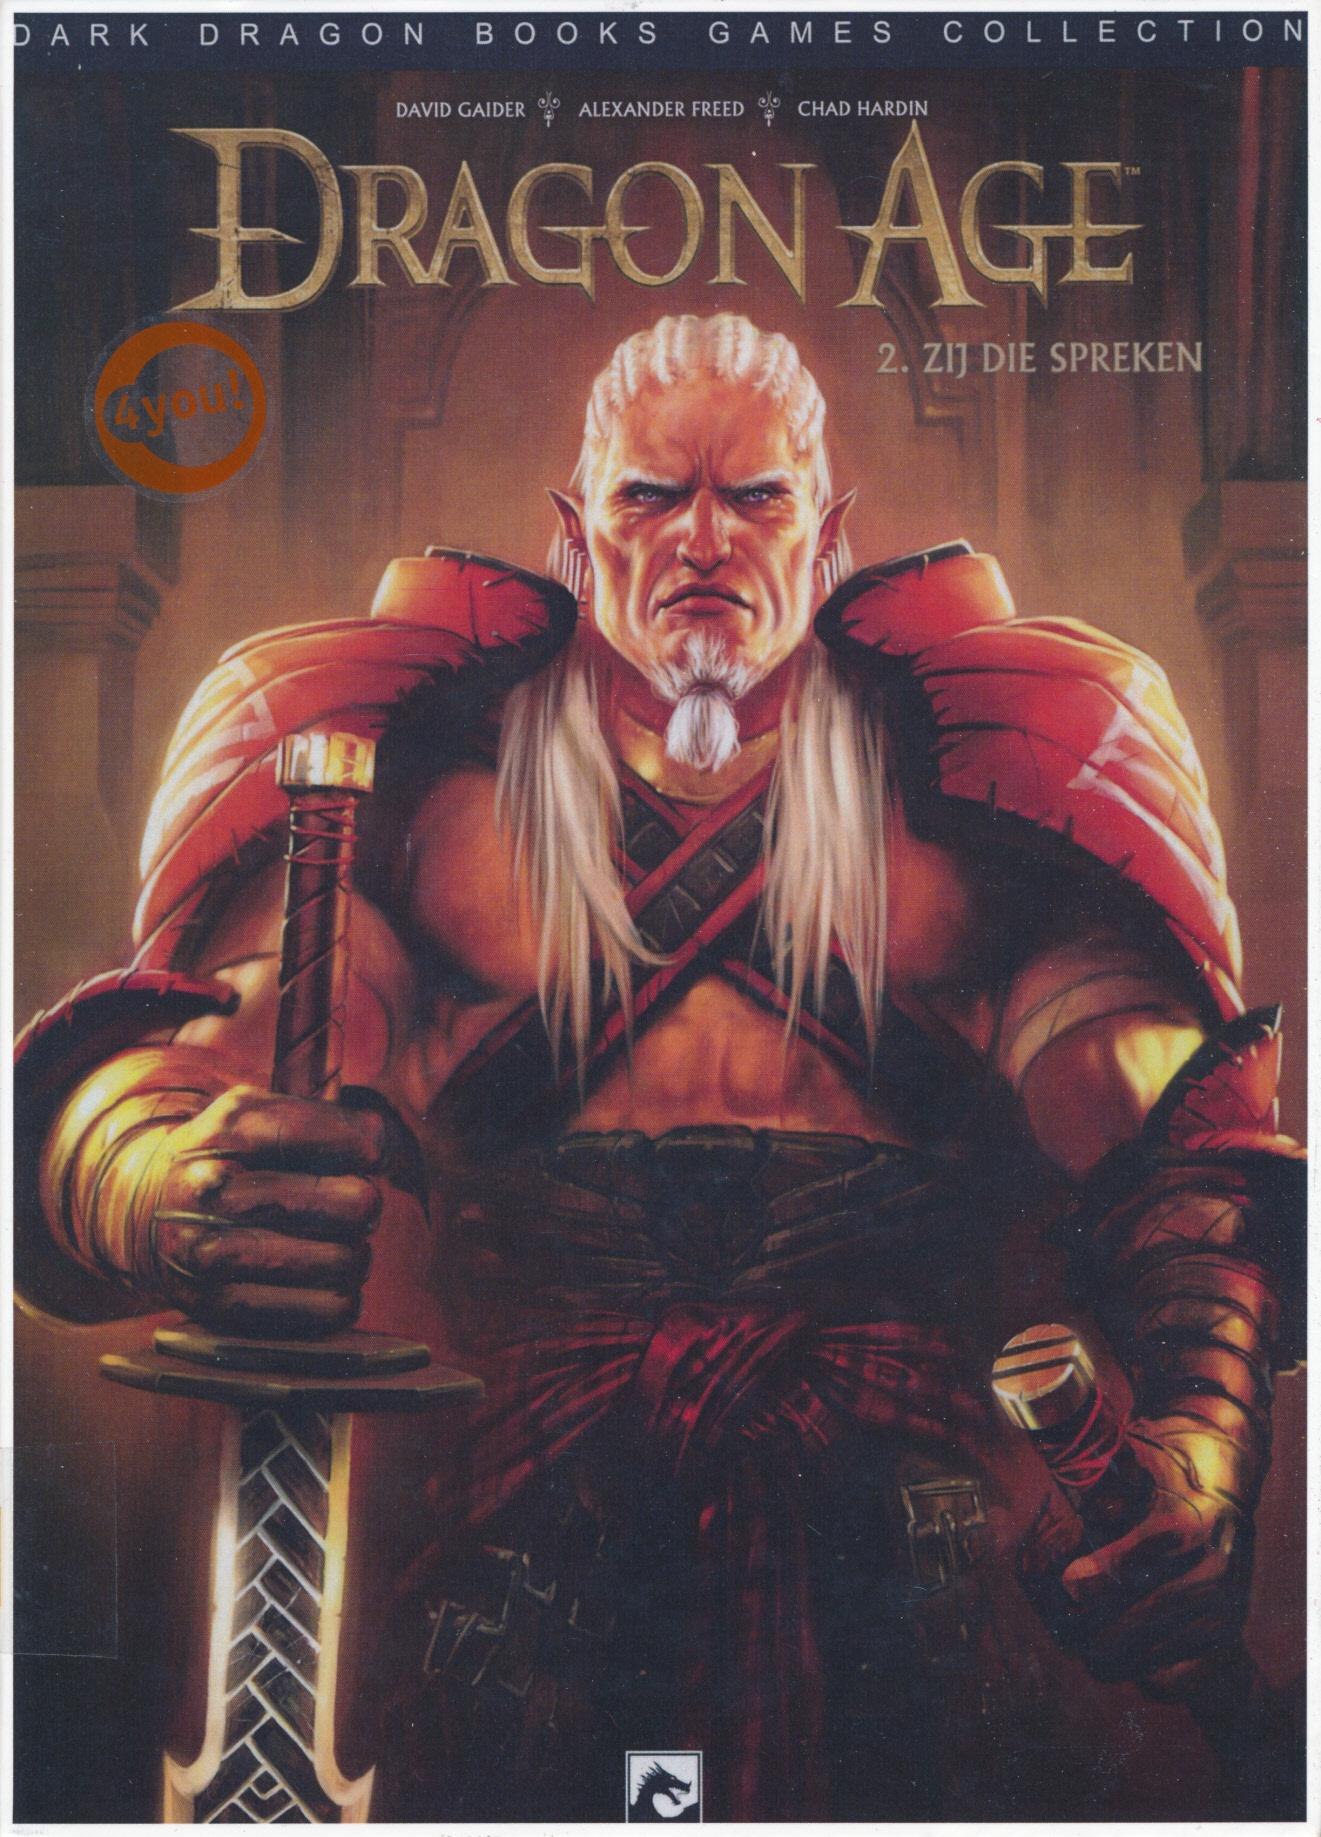 Dragon Age - 02 - Zij Die Spreken